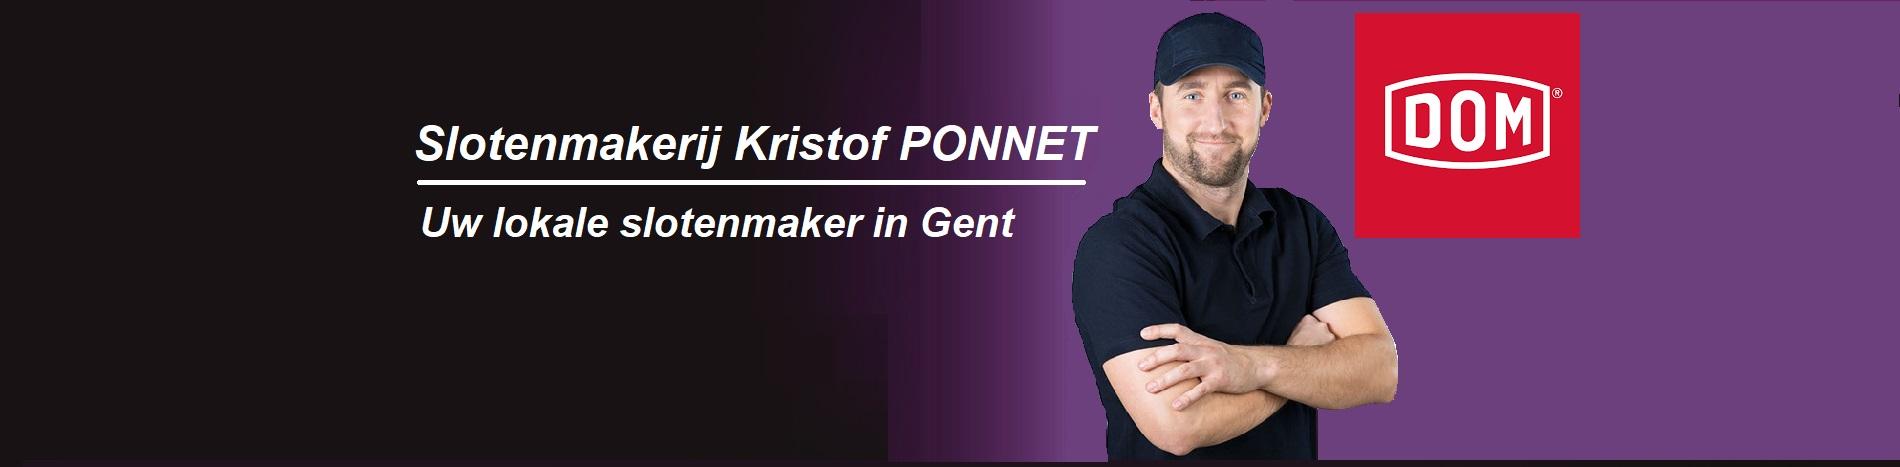 Gent Slotenmaker Kristof Ponnet